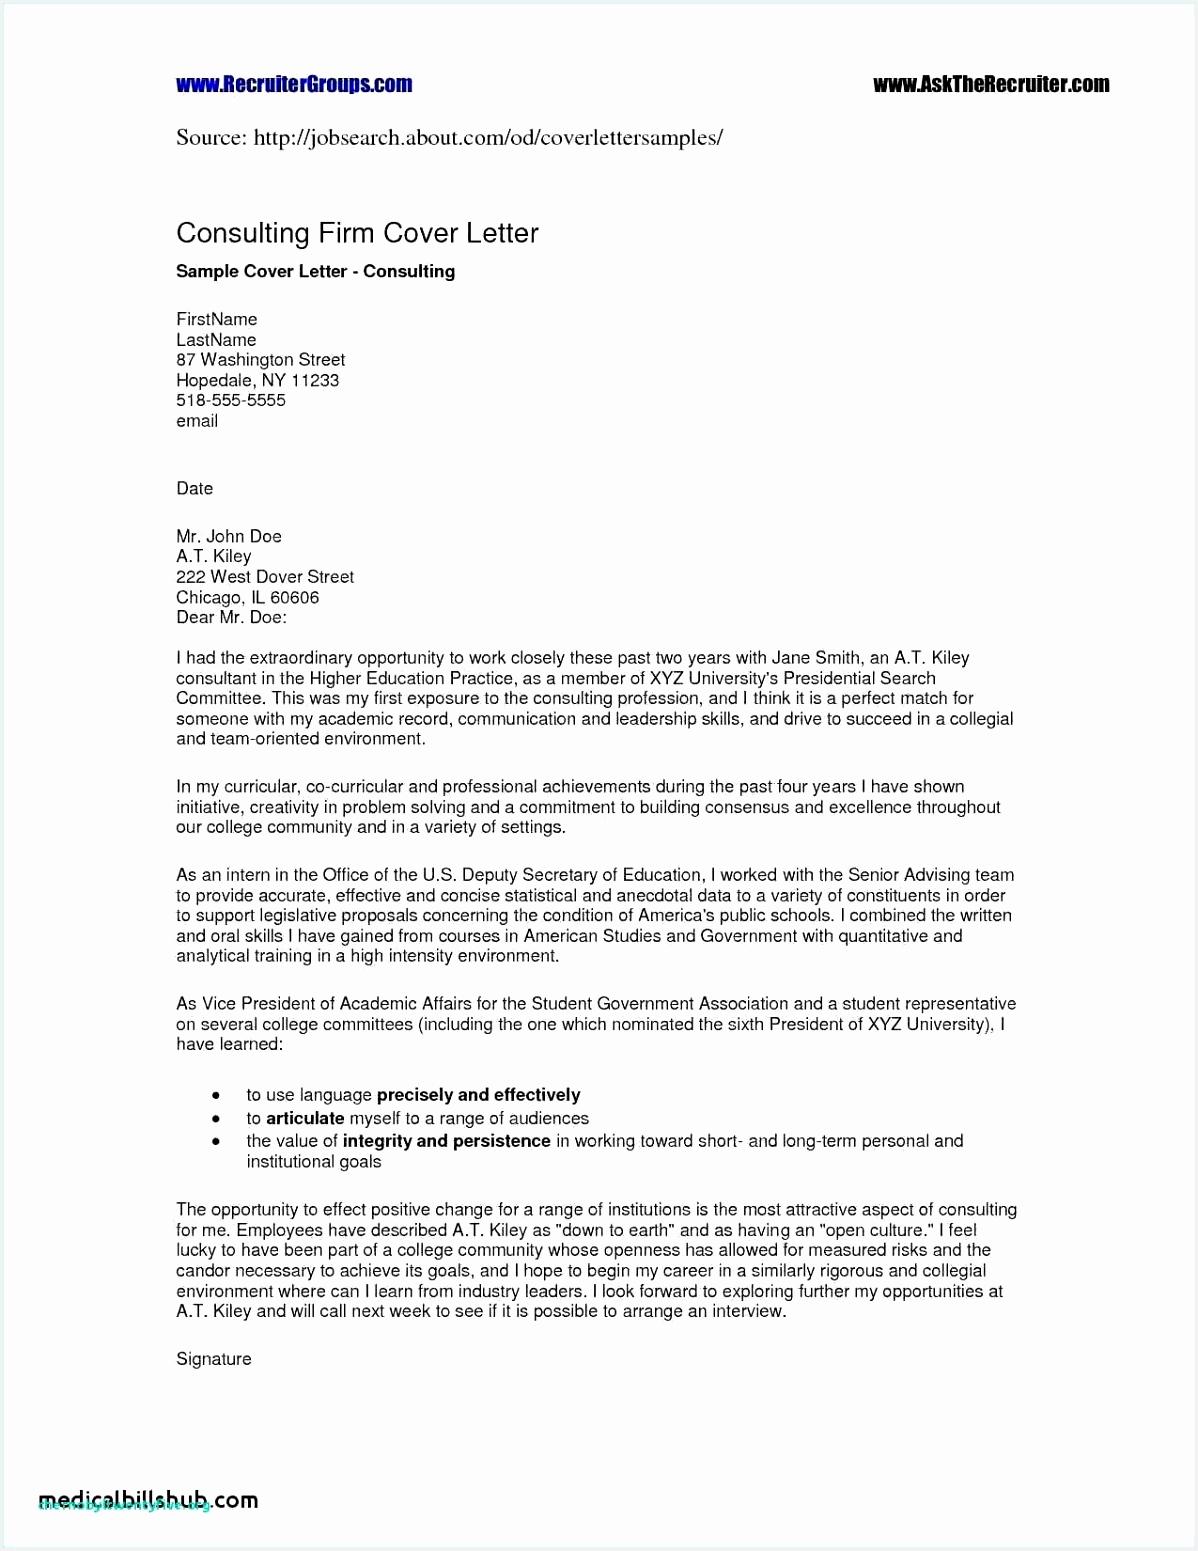 Medical Billing Specialist Cover Letter Medical Billing and Coding Sample Resume For Medical Billing Specialist 15511198ujkhb